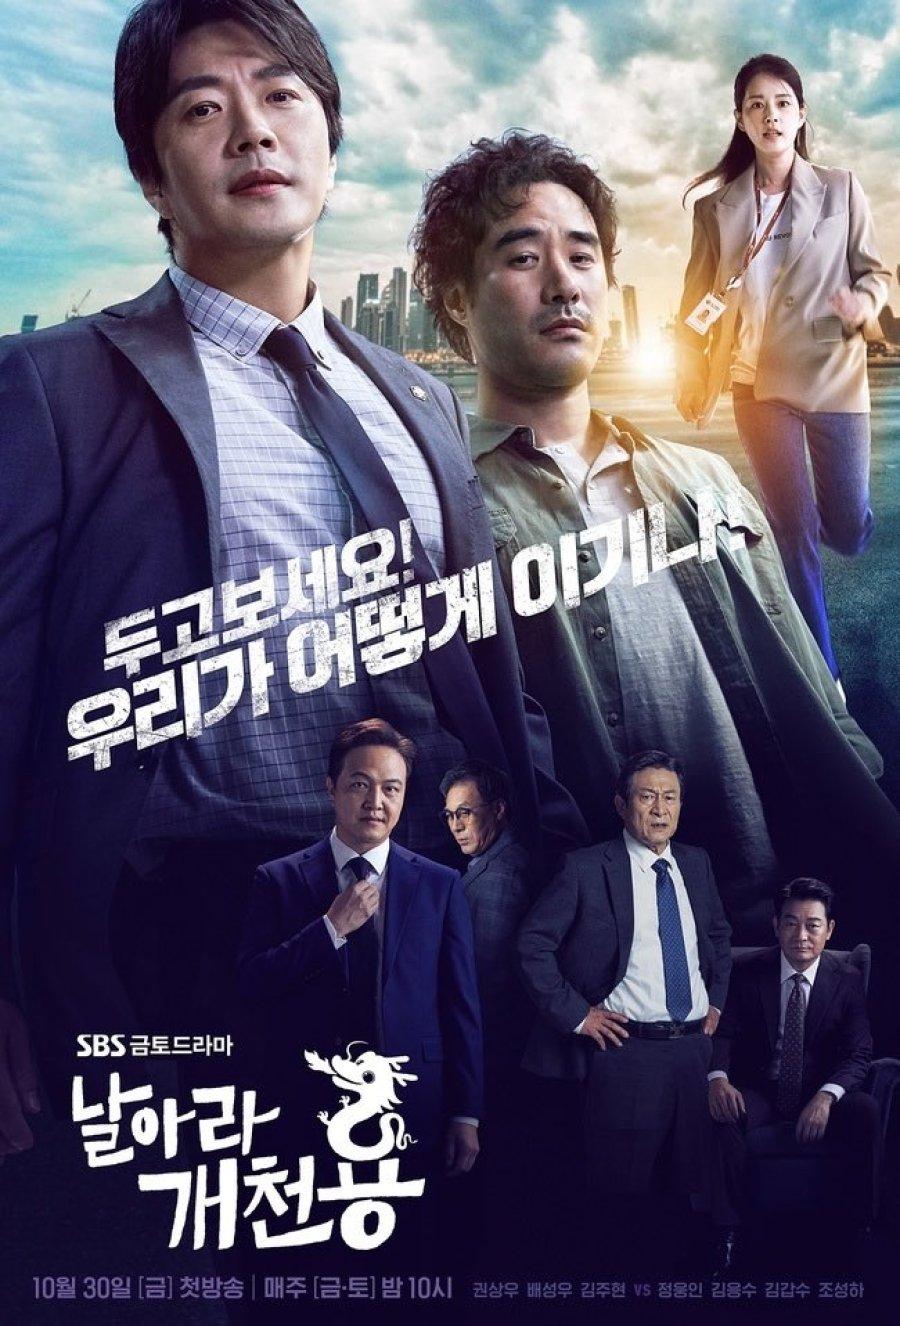 Poster drama Korea Delayed Justice